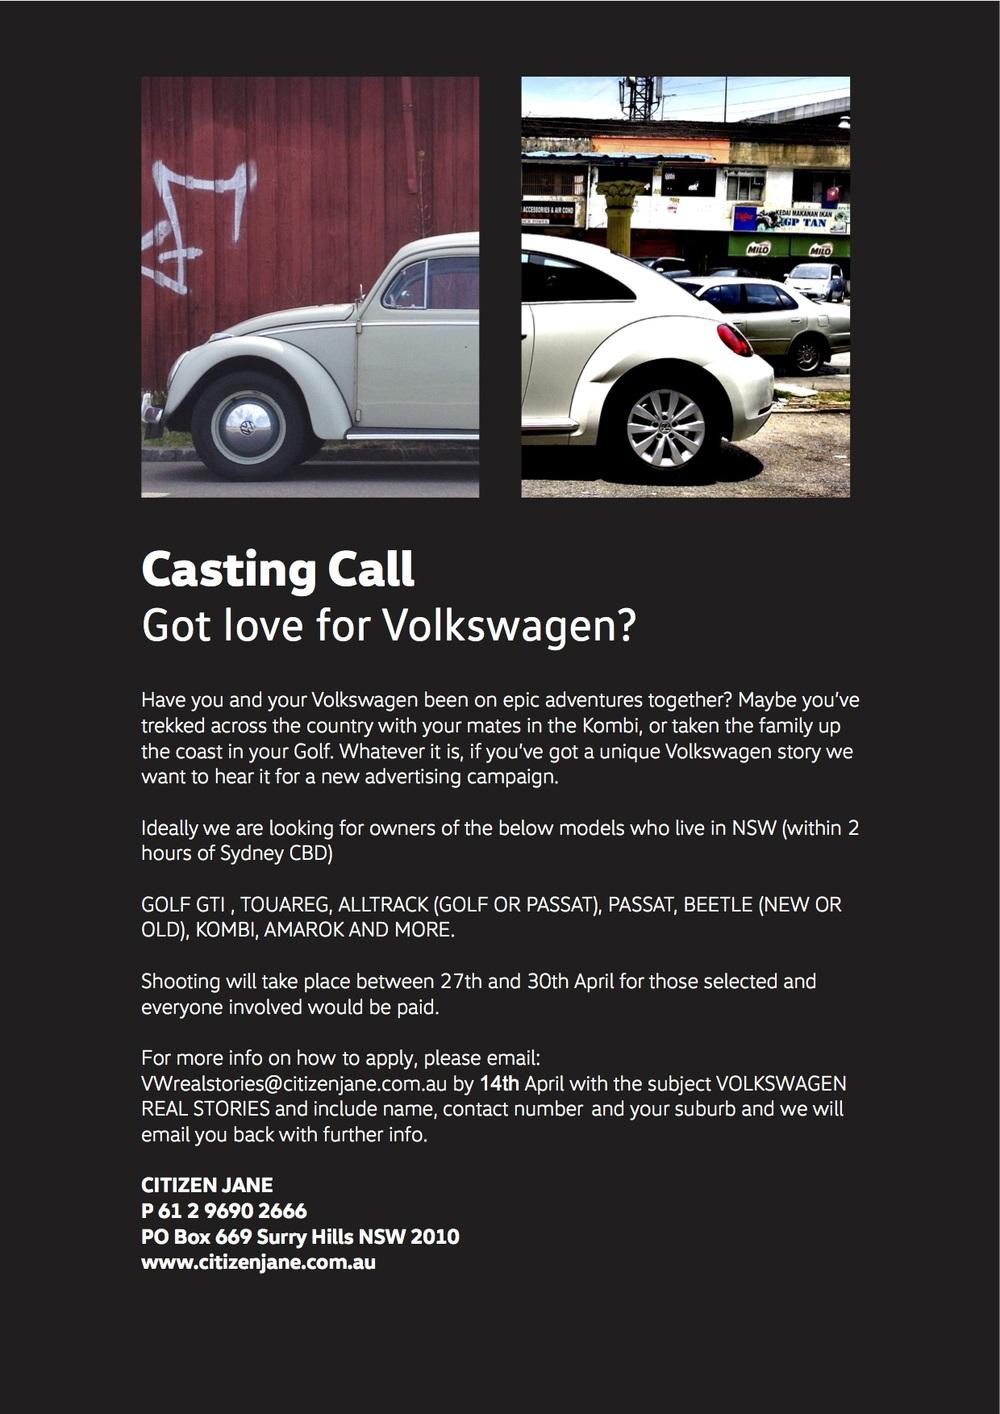 Brand Love_Casting Call_14.04.16.img copy.jpg